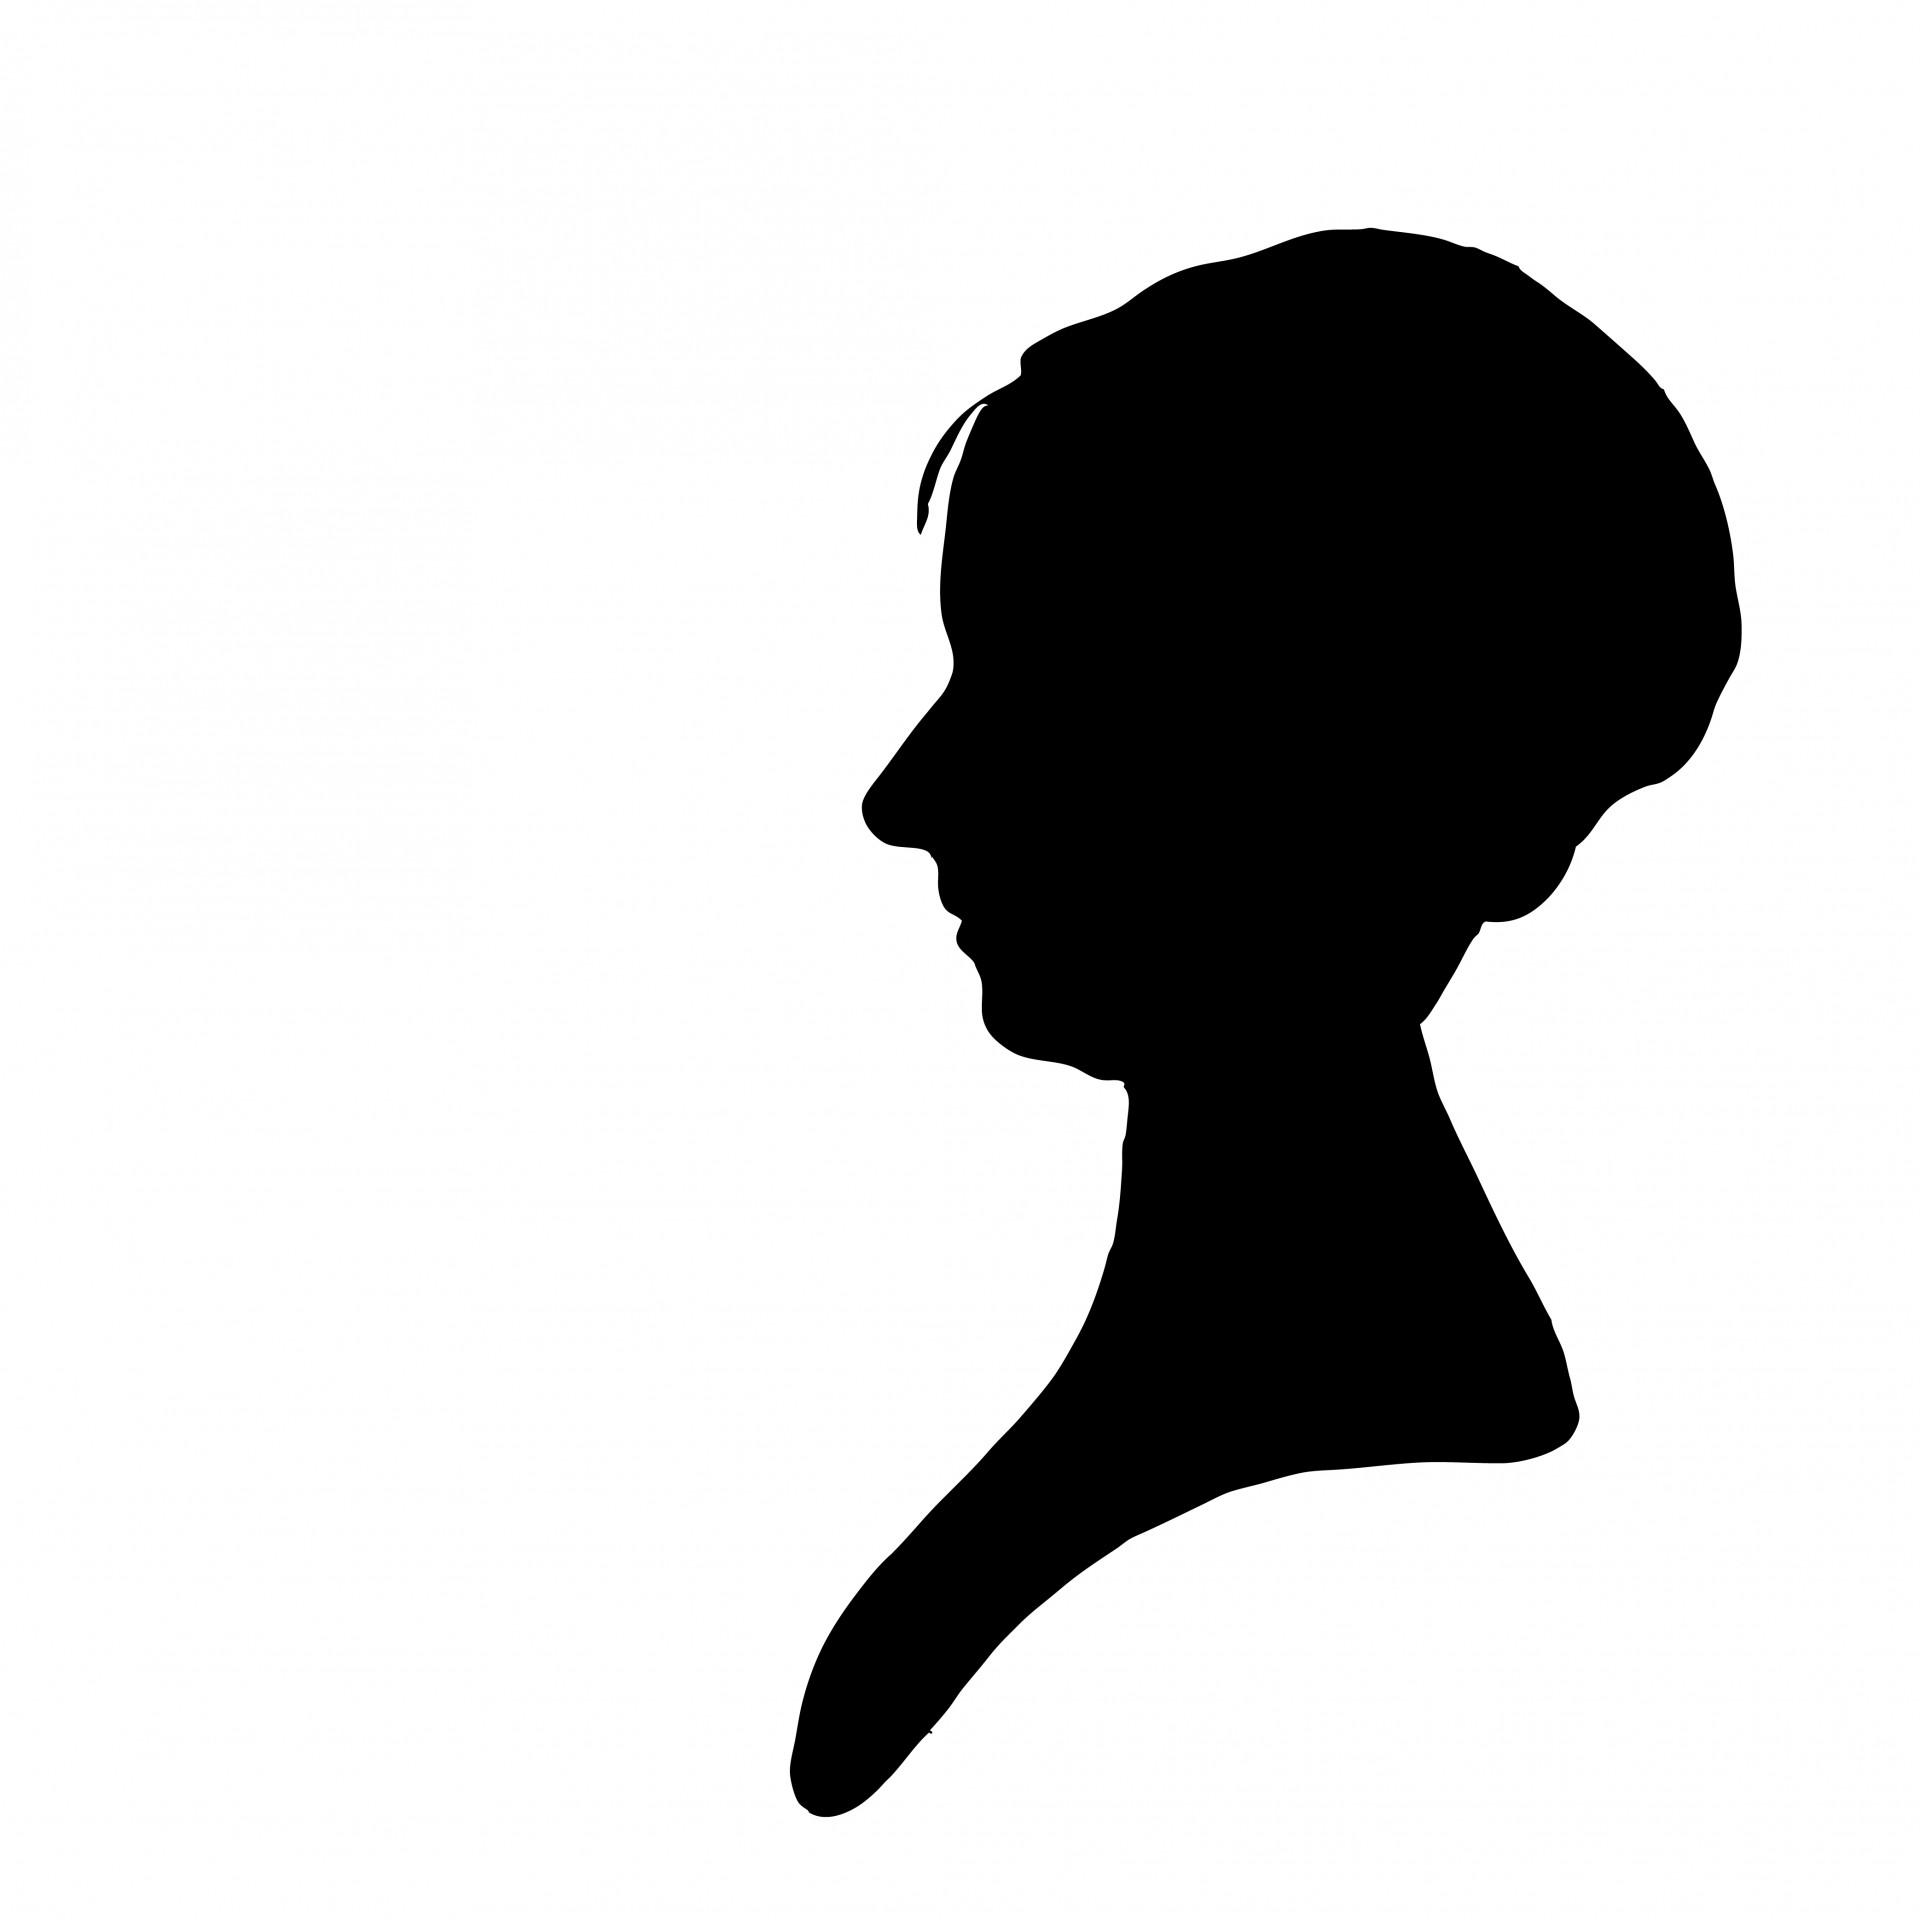 1920x1920 Woman Profile Silhouette Clipart Free Stock Photo